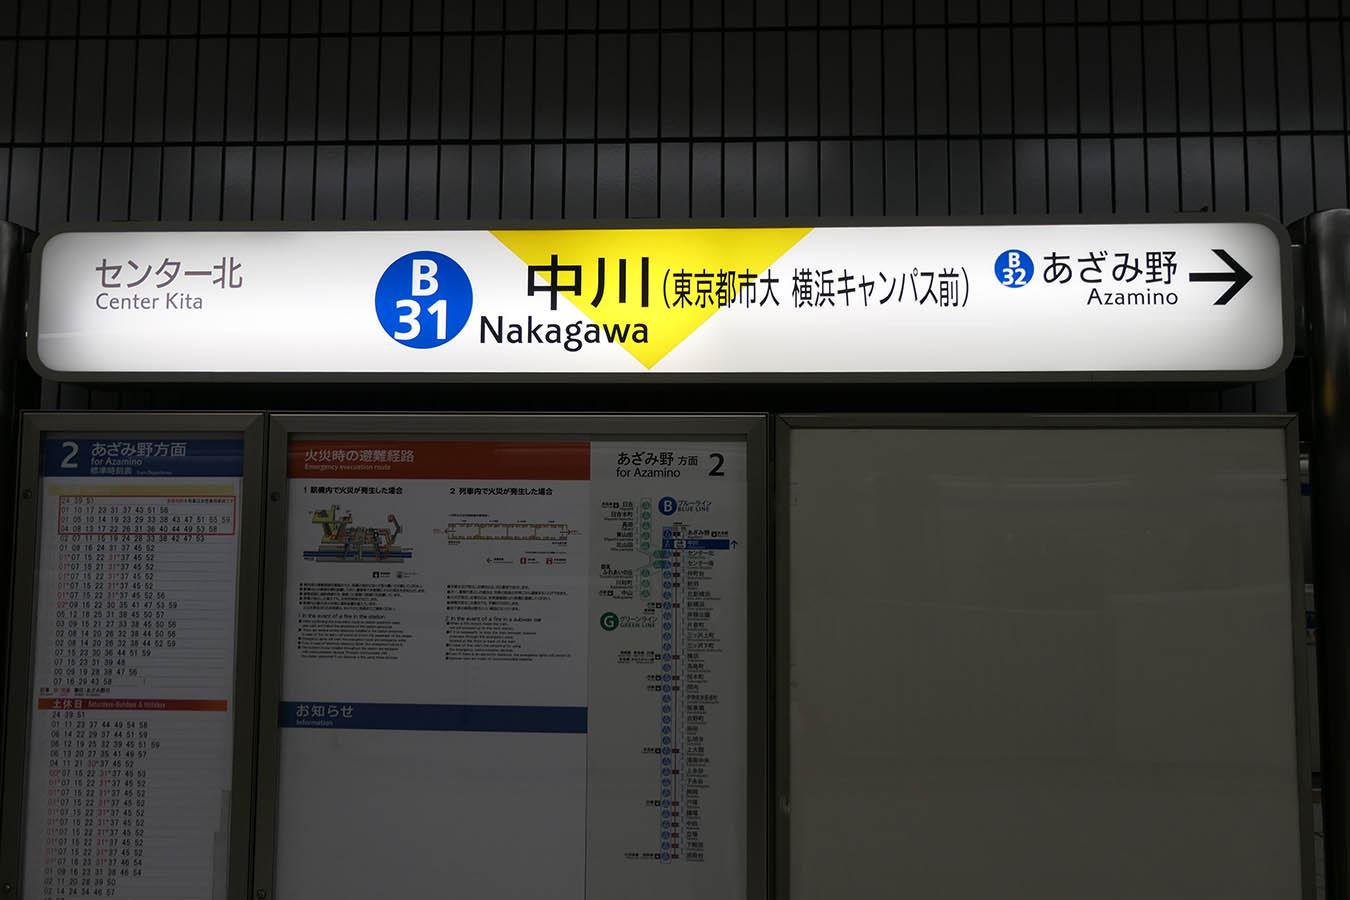 YMS-B31_photo05.jpg